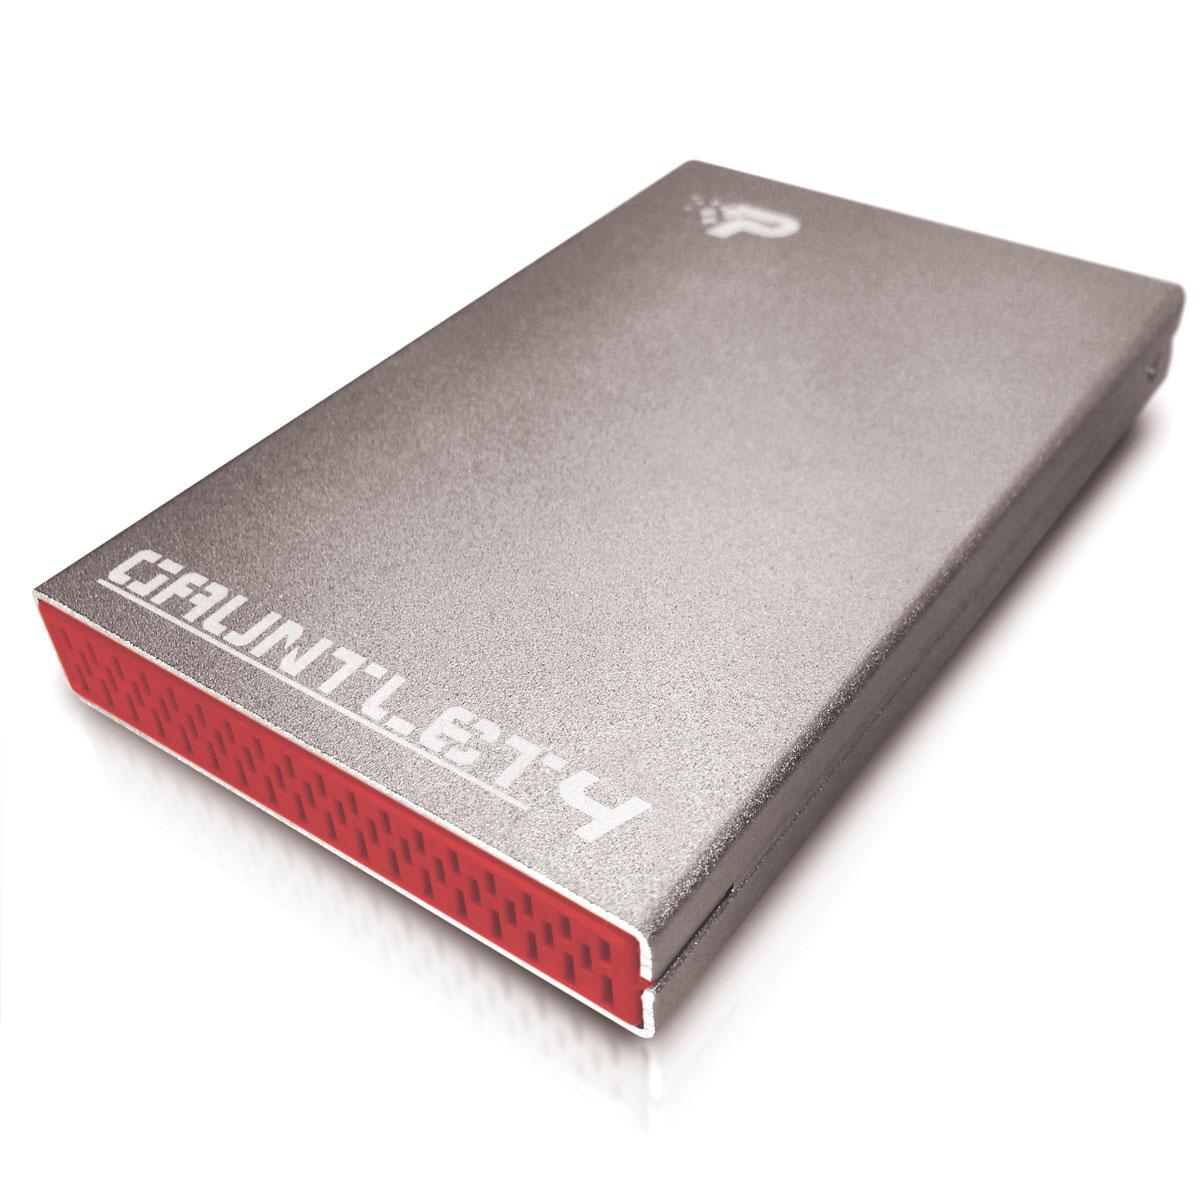 Patriot Gauntlet 4 Aluminum USB 3.1 externí box pro SSD a HDD 2,5'' - PCGT425S